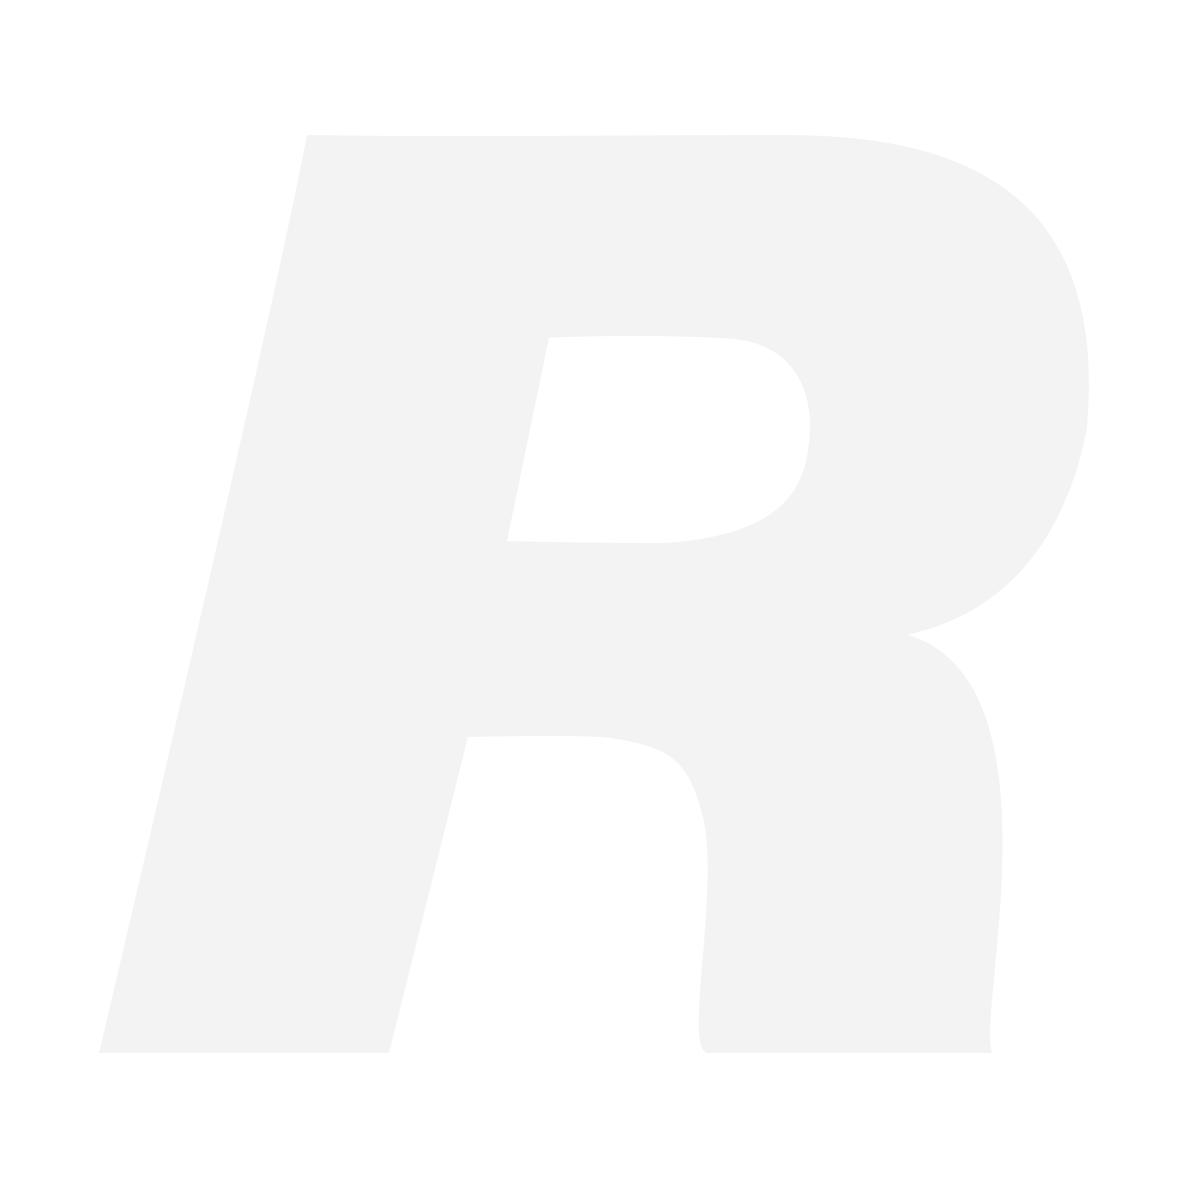 BLACK RAPID ARCA-SWISS 70 PLATE